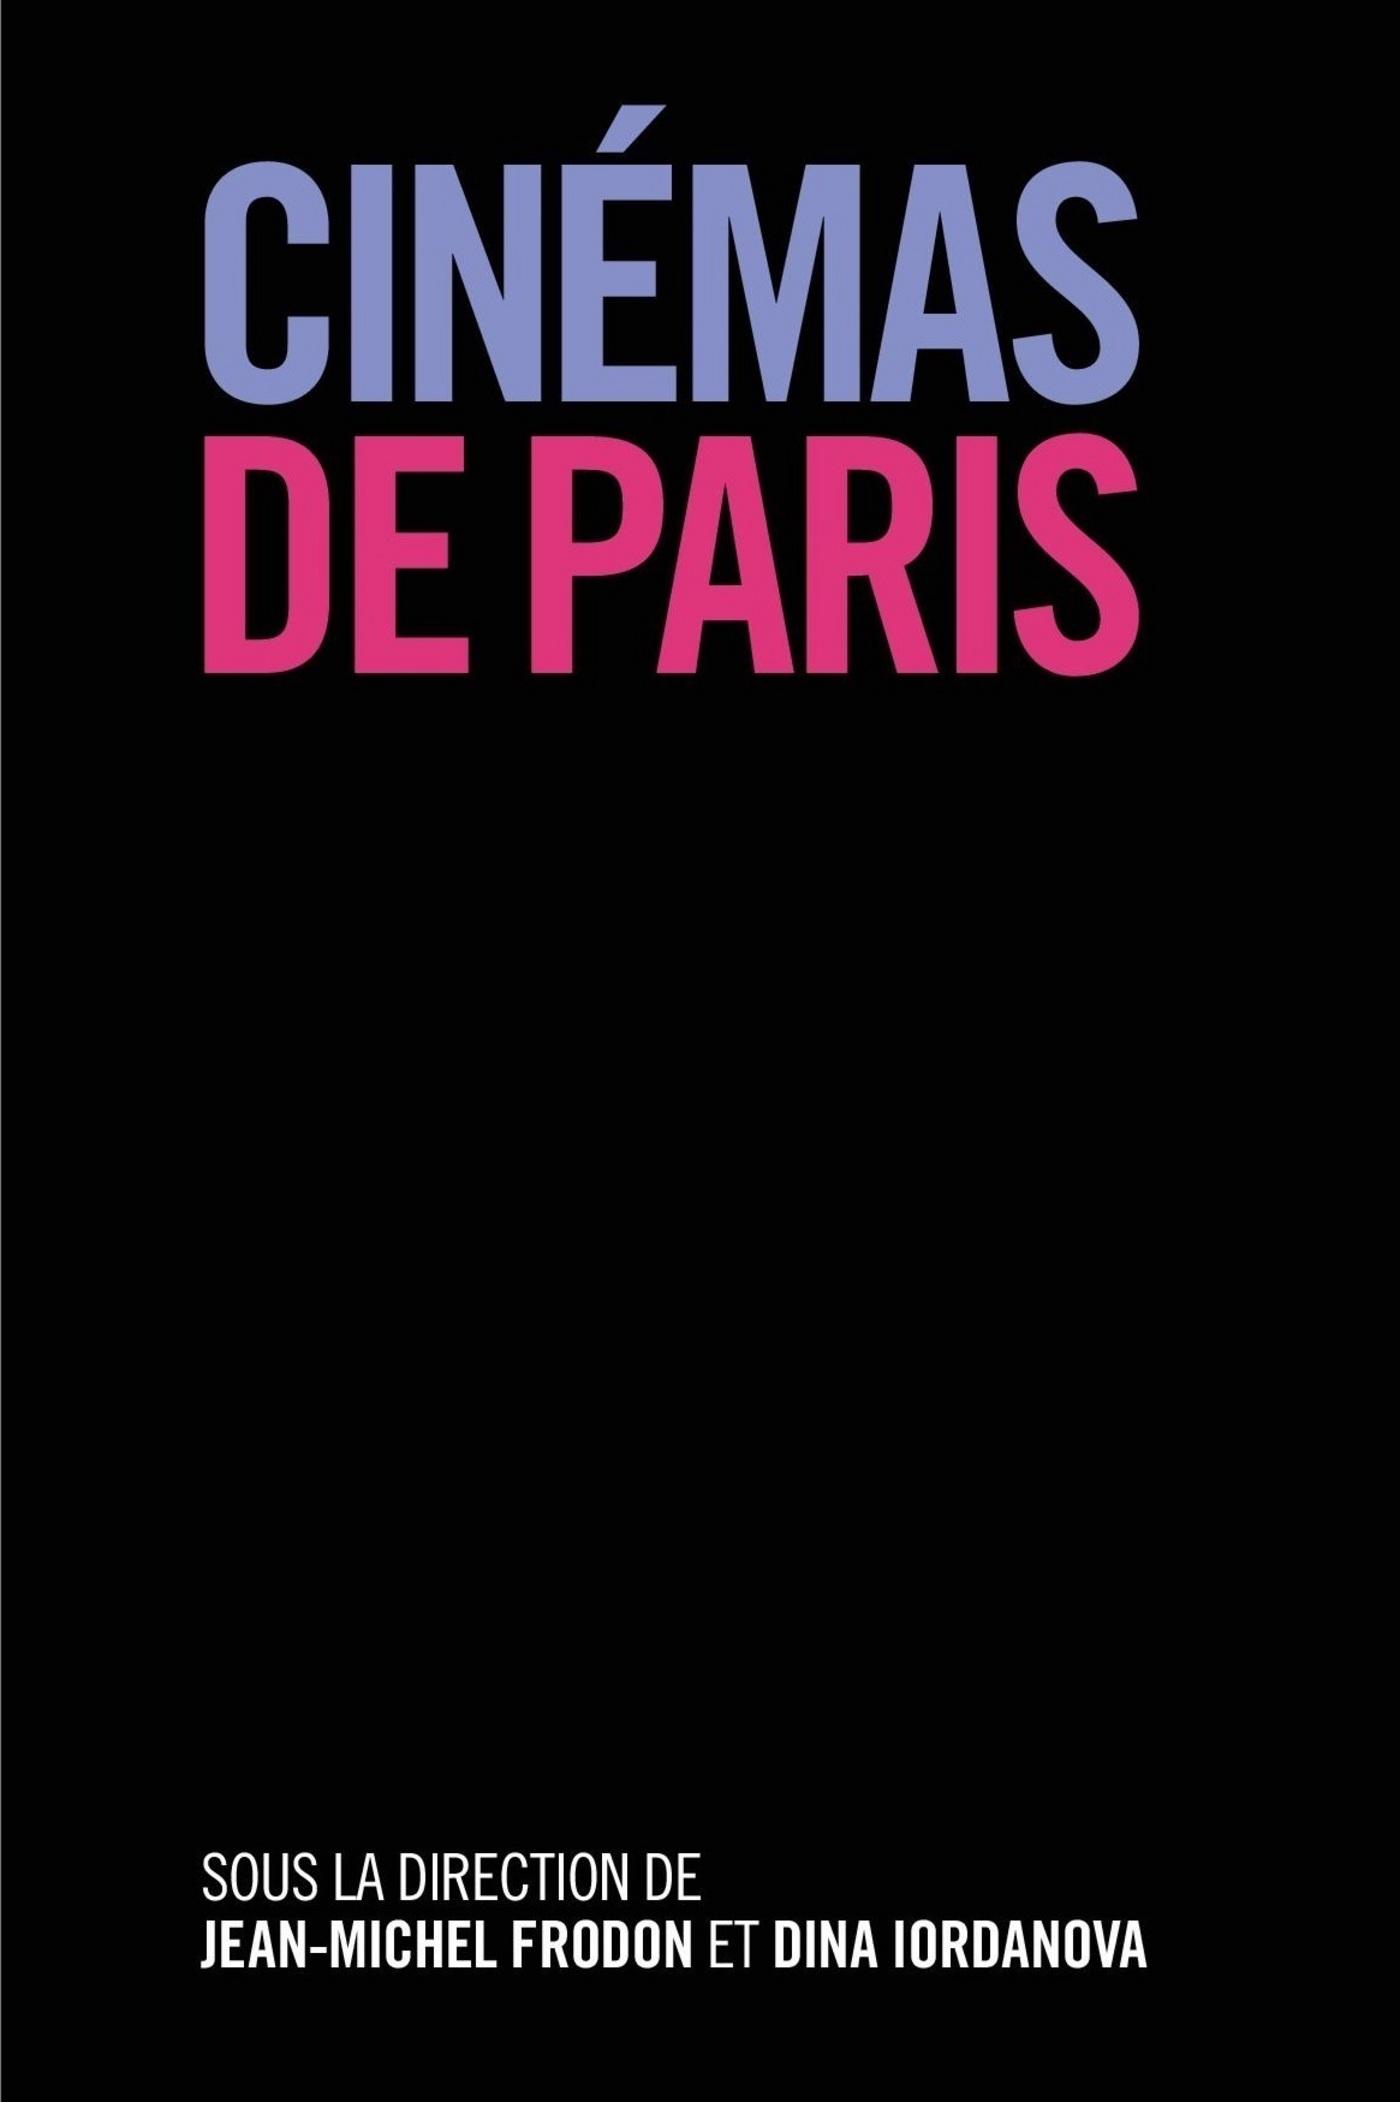 Cinémas de Paris